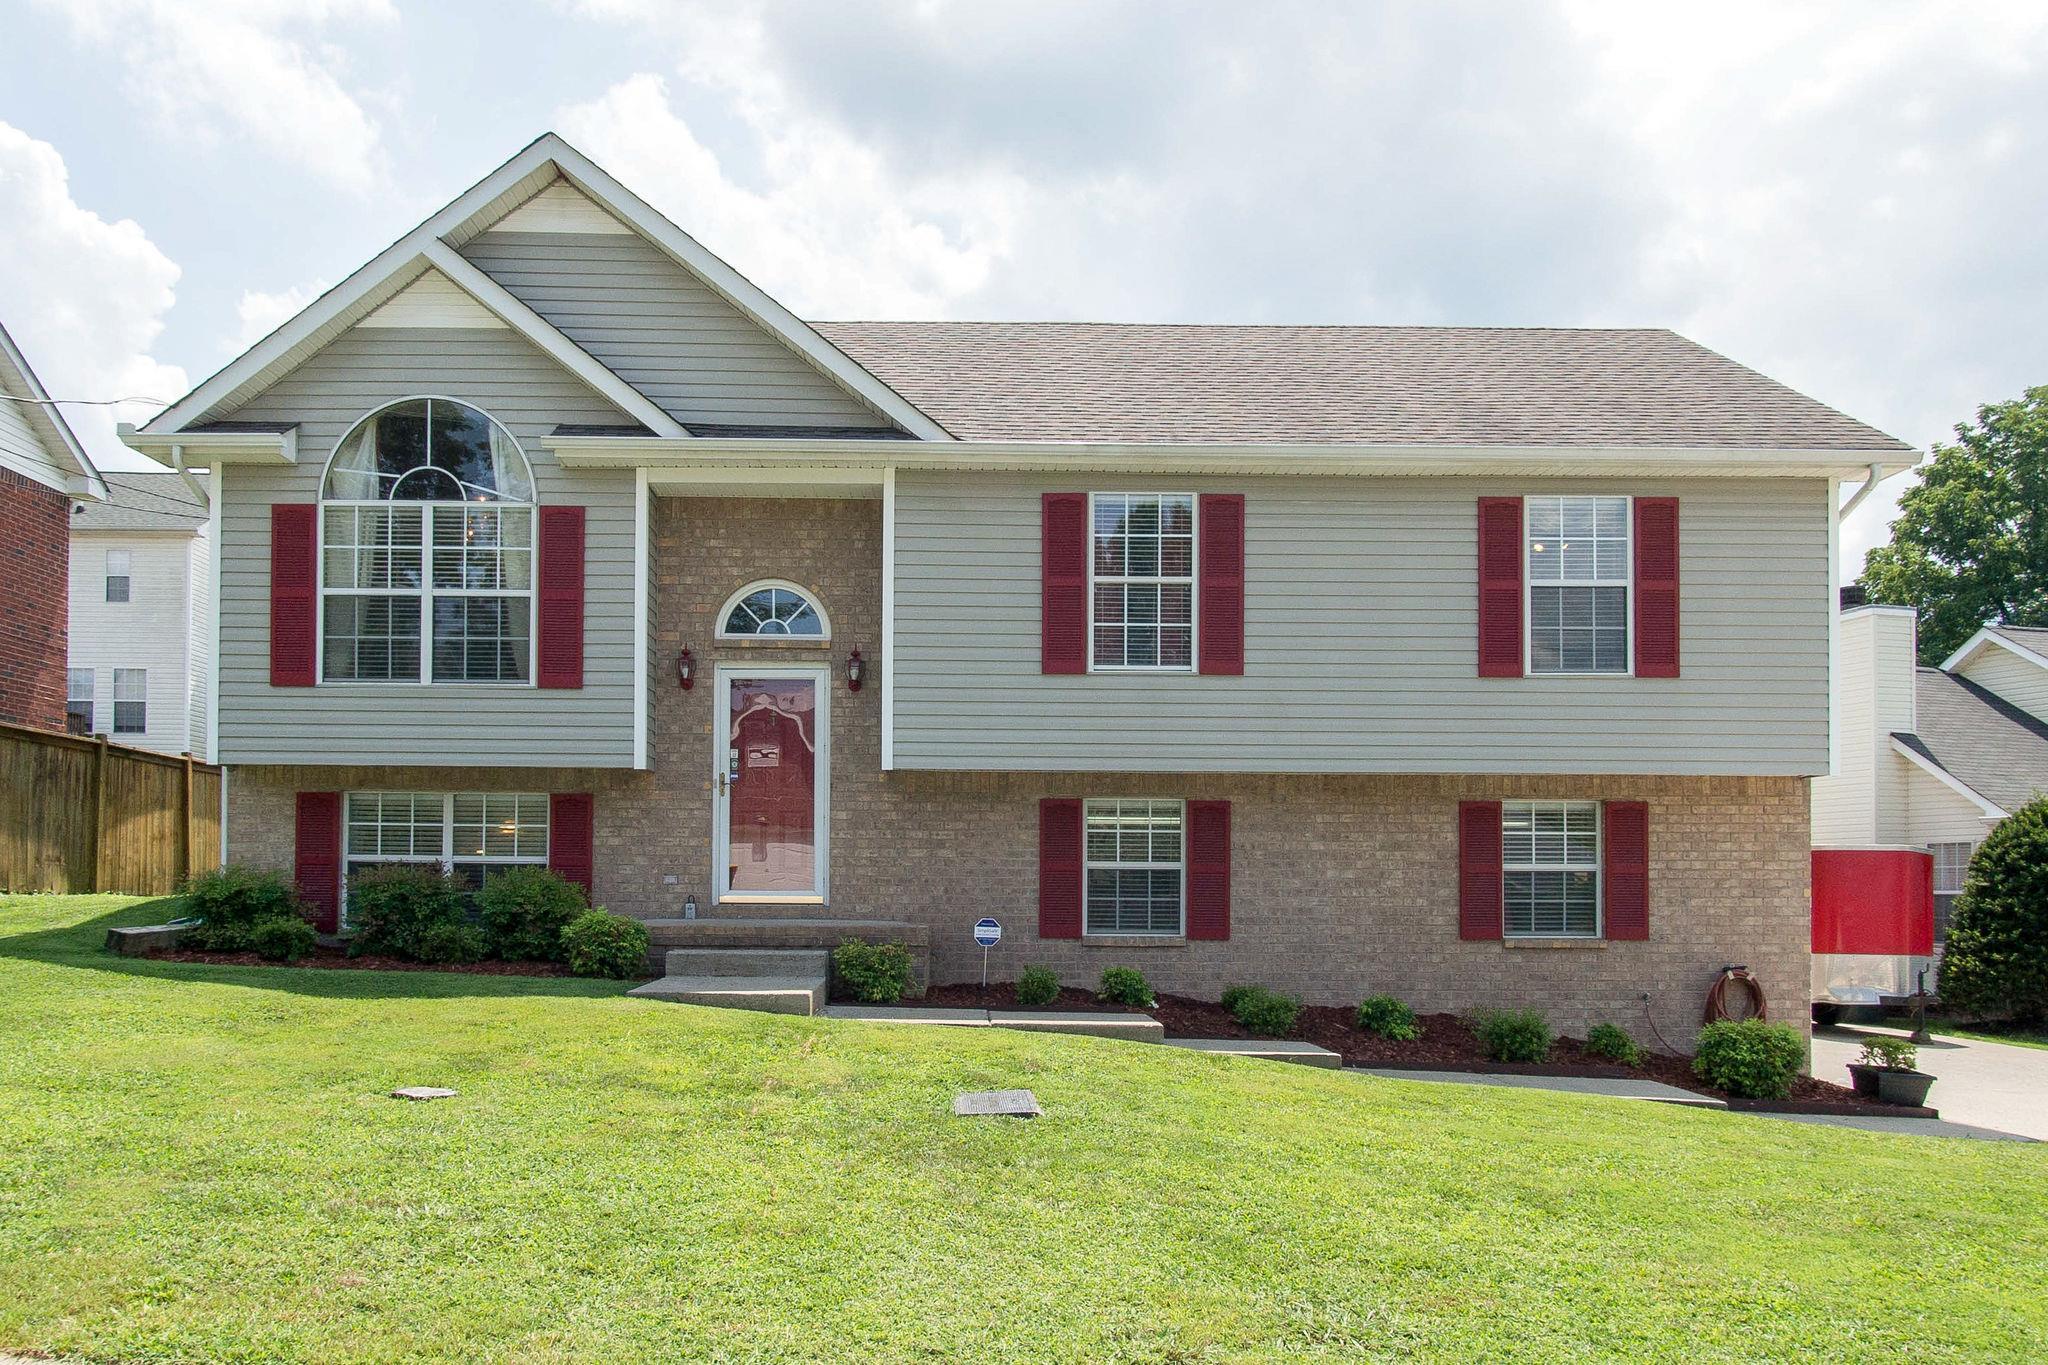 209 Fitzpatrick Place, Nashville, TN 37214 - Nashville, TN real estate listing